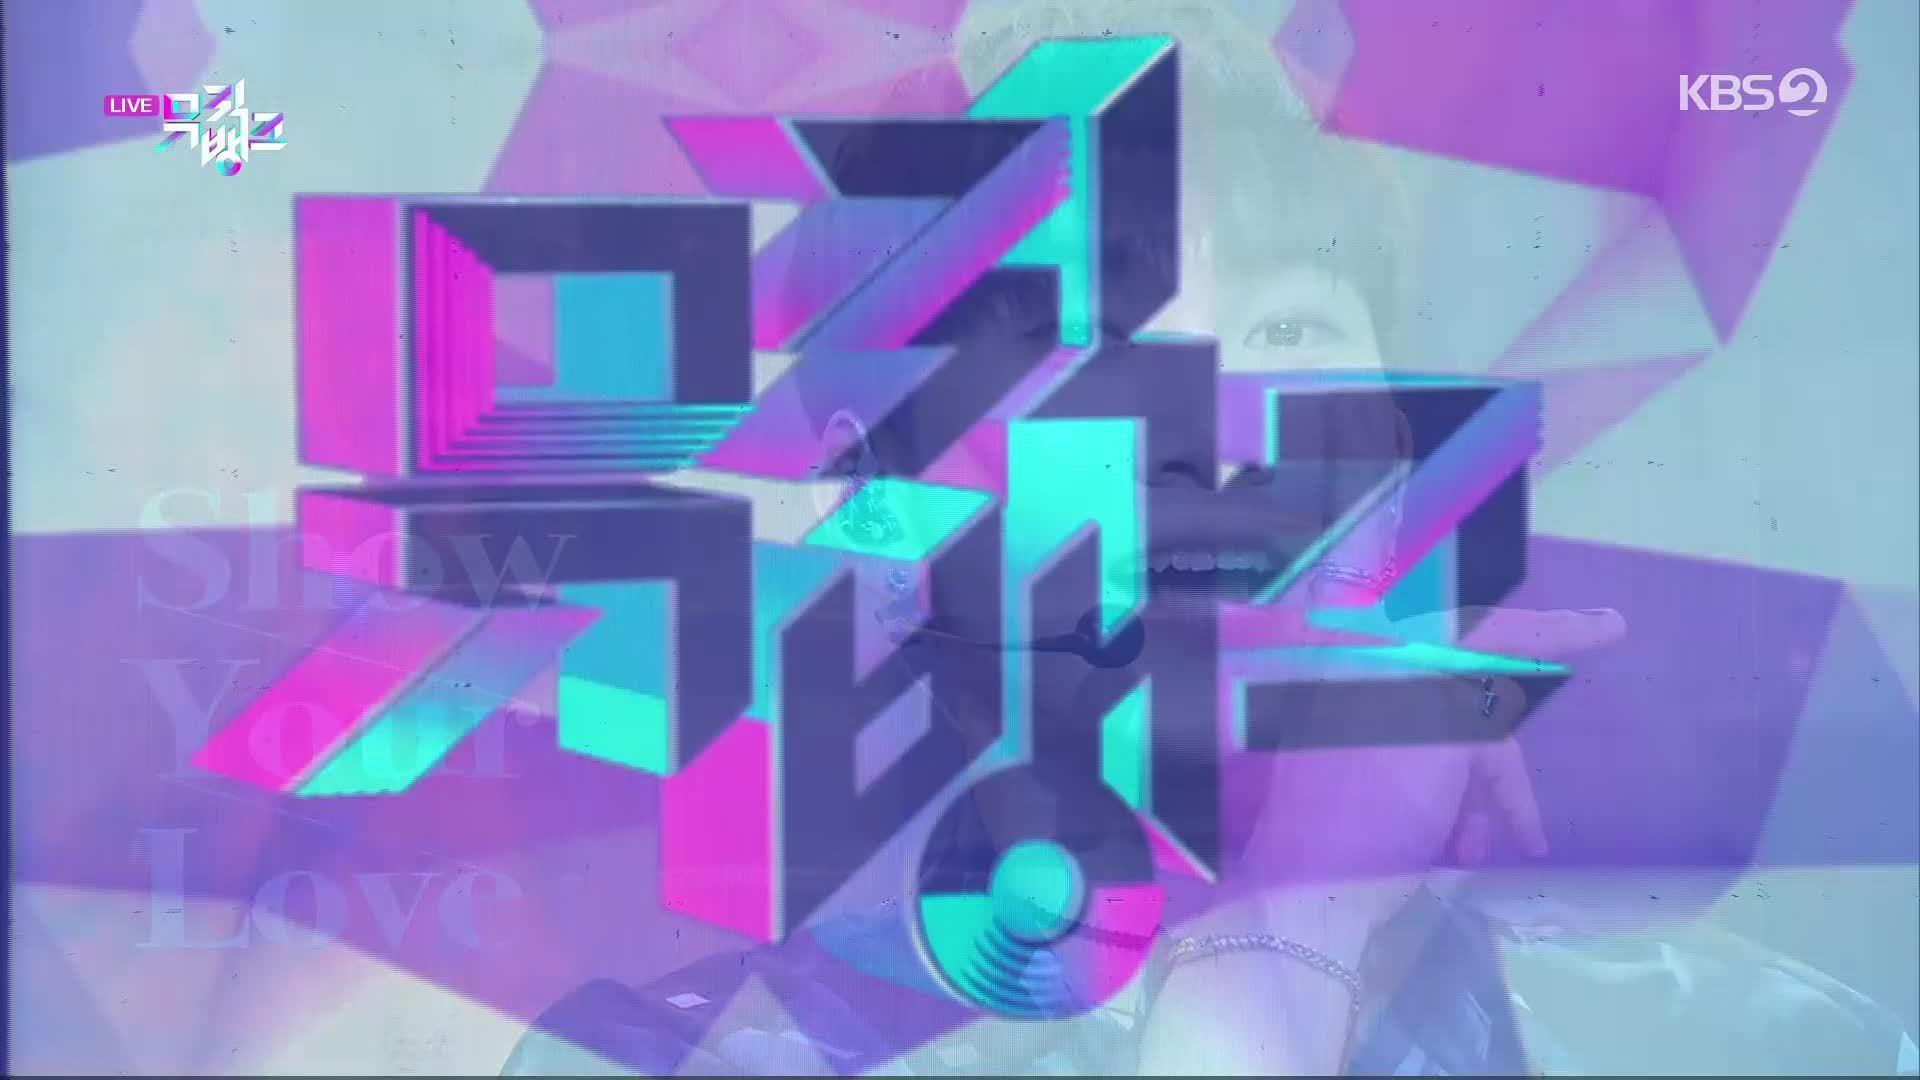 BTS NO.1 201120 KBS Music Bank D1直播室正在直播中…………